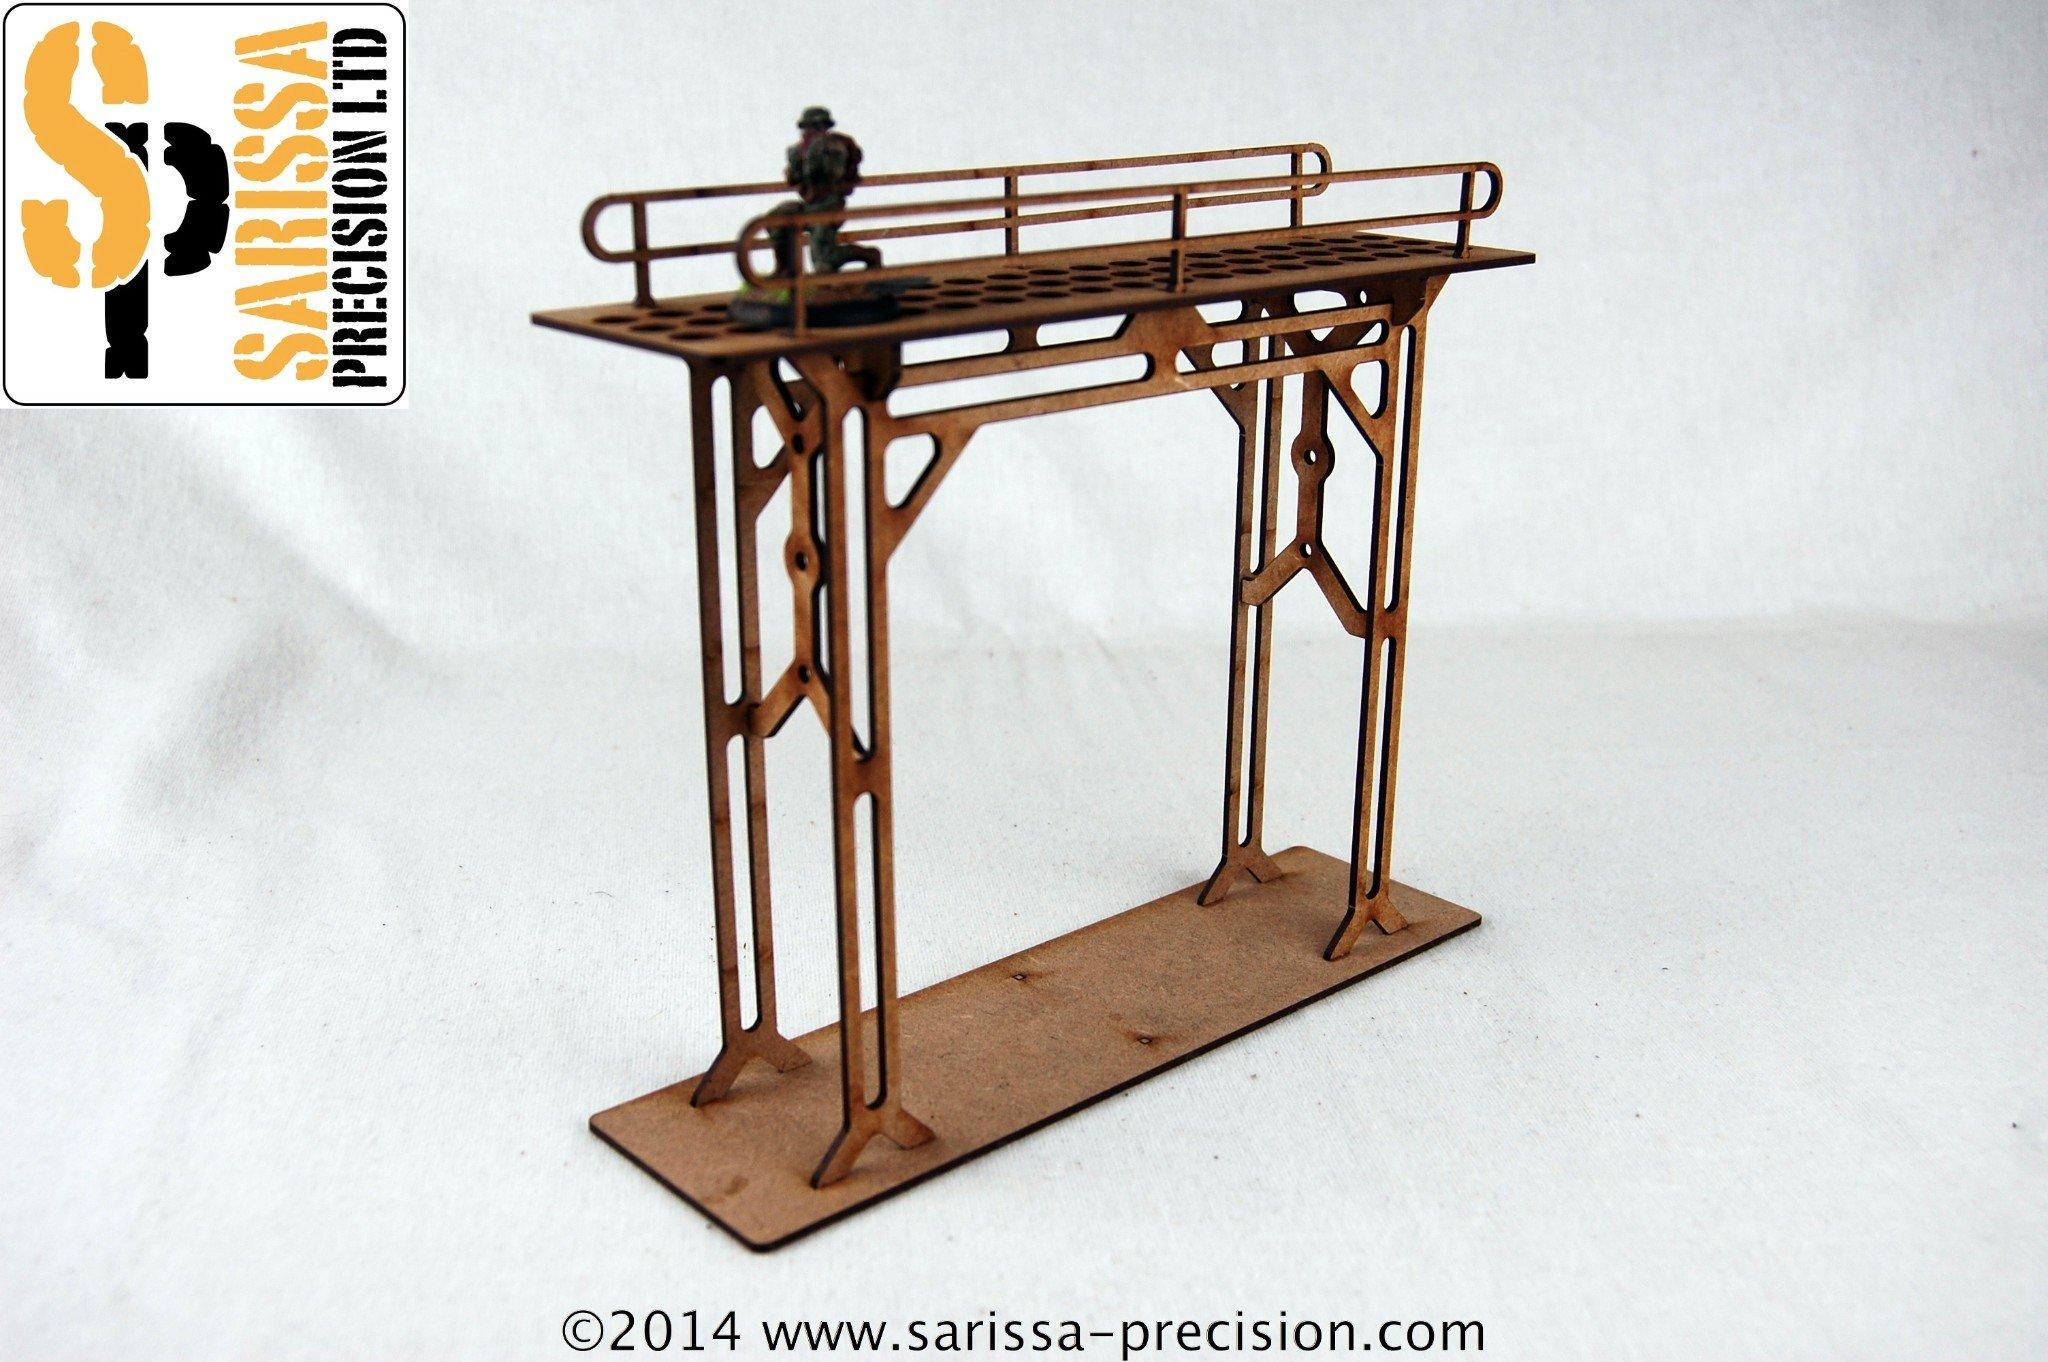 Gantry High Long, Sarissa Precision